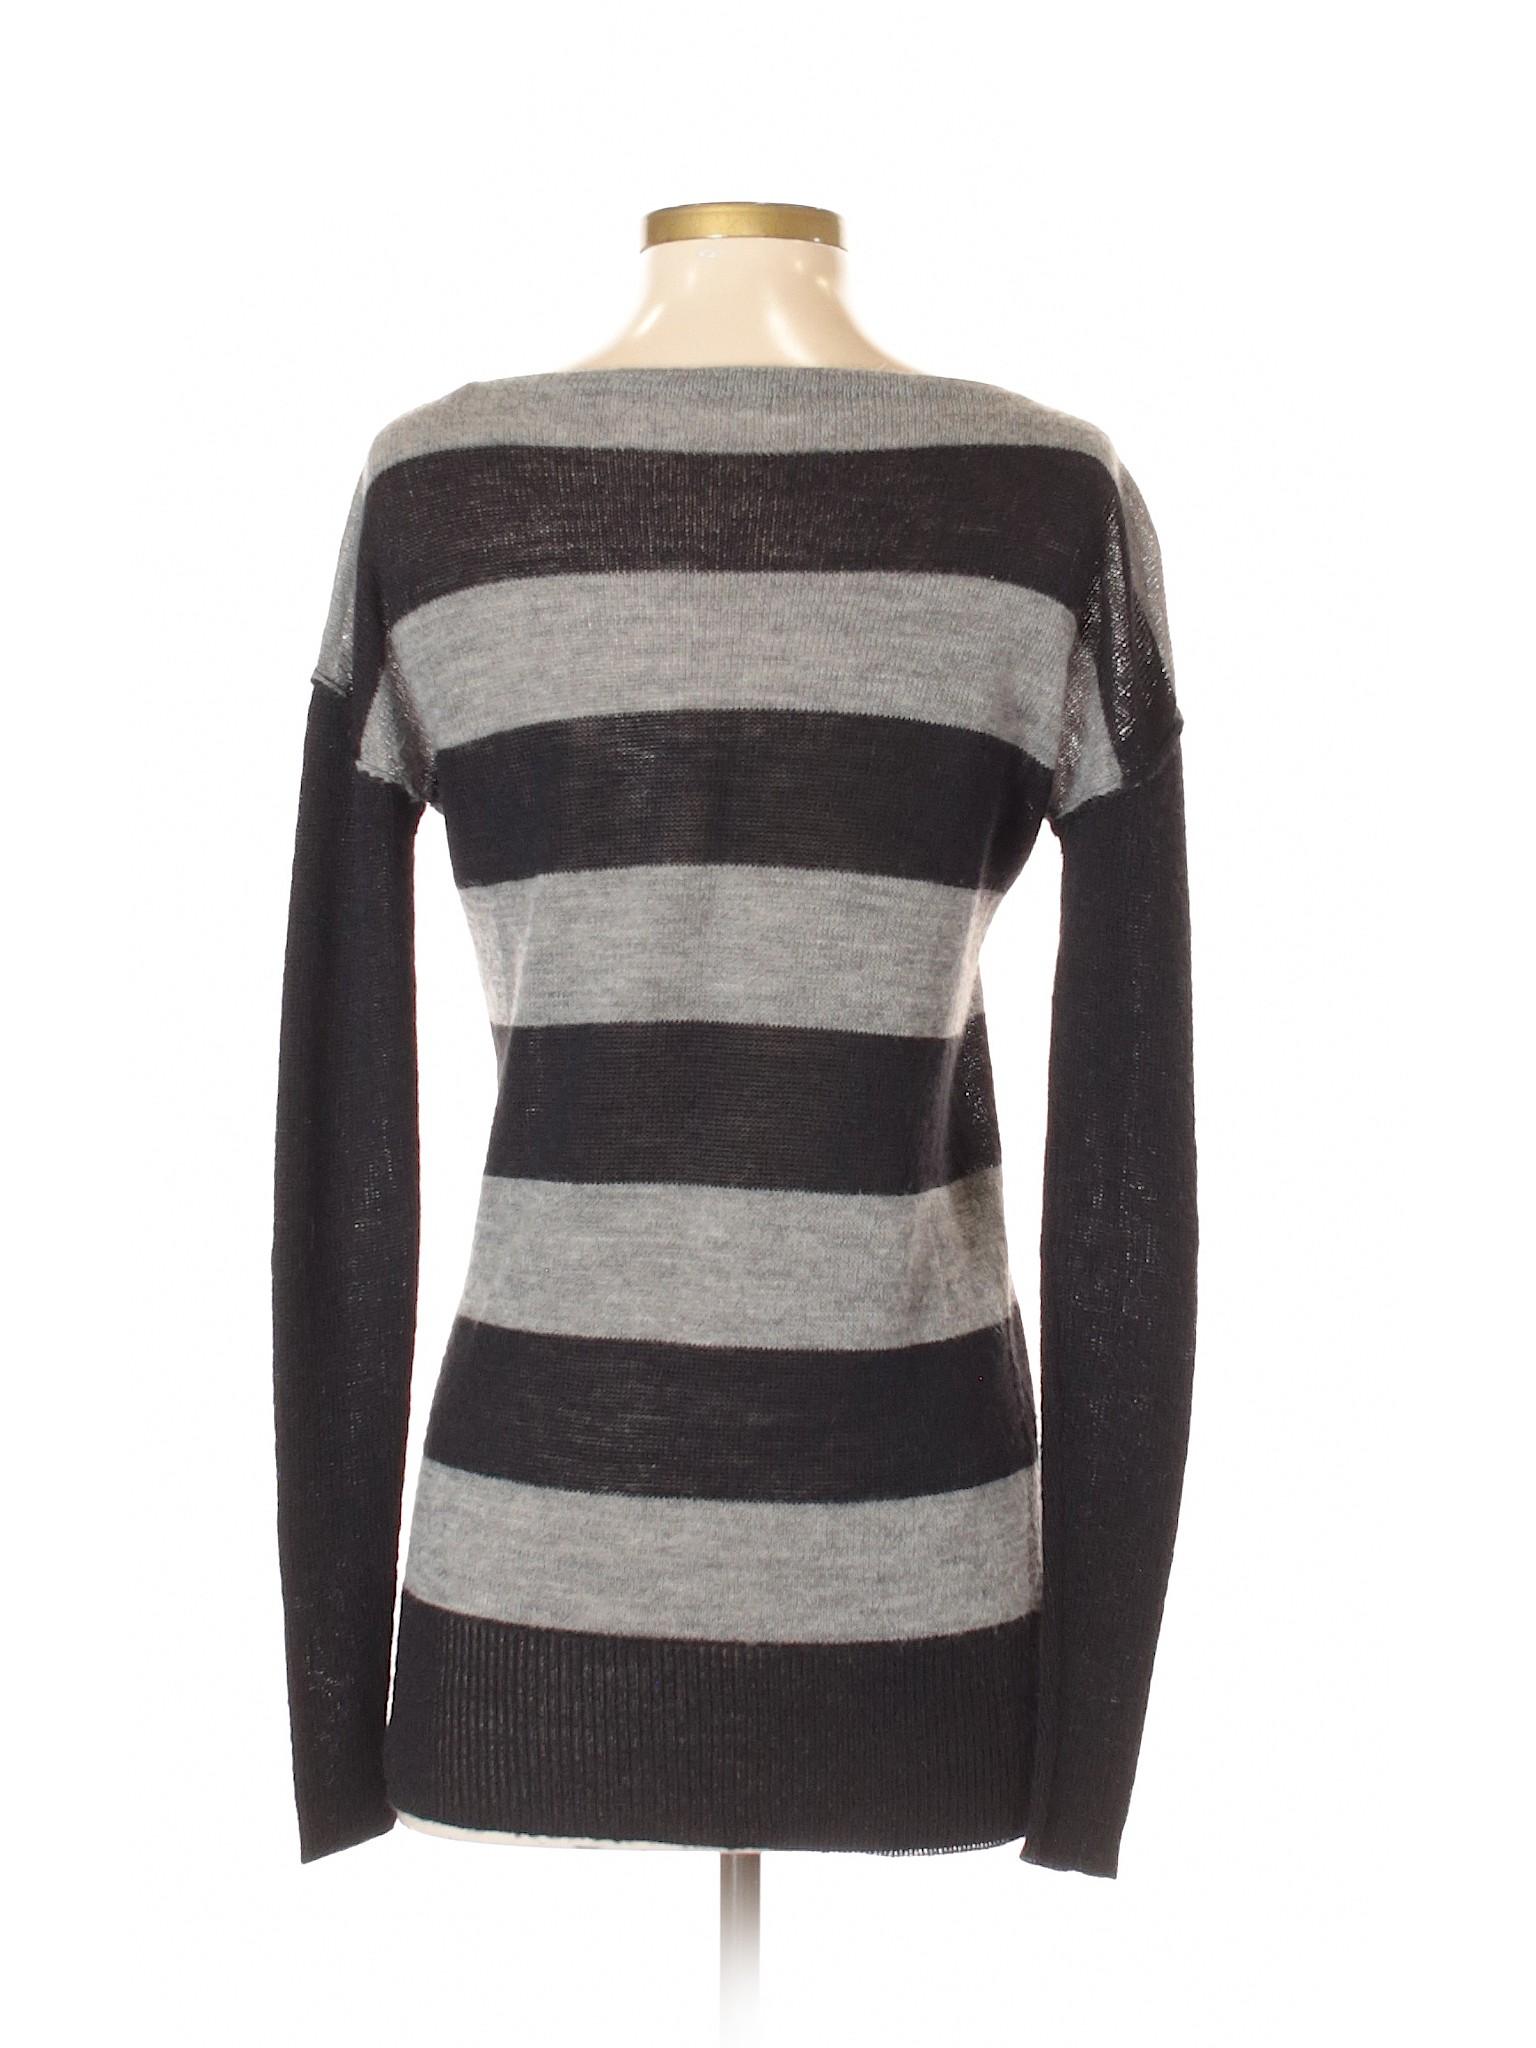 Boutique Crew J J Crew Pullover Boutique Boutique Pullover Sweater Sweater qv0Xn